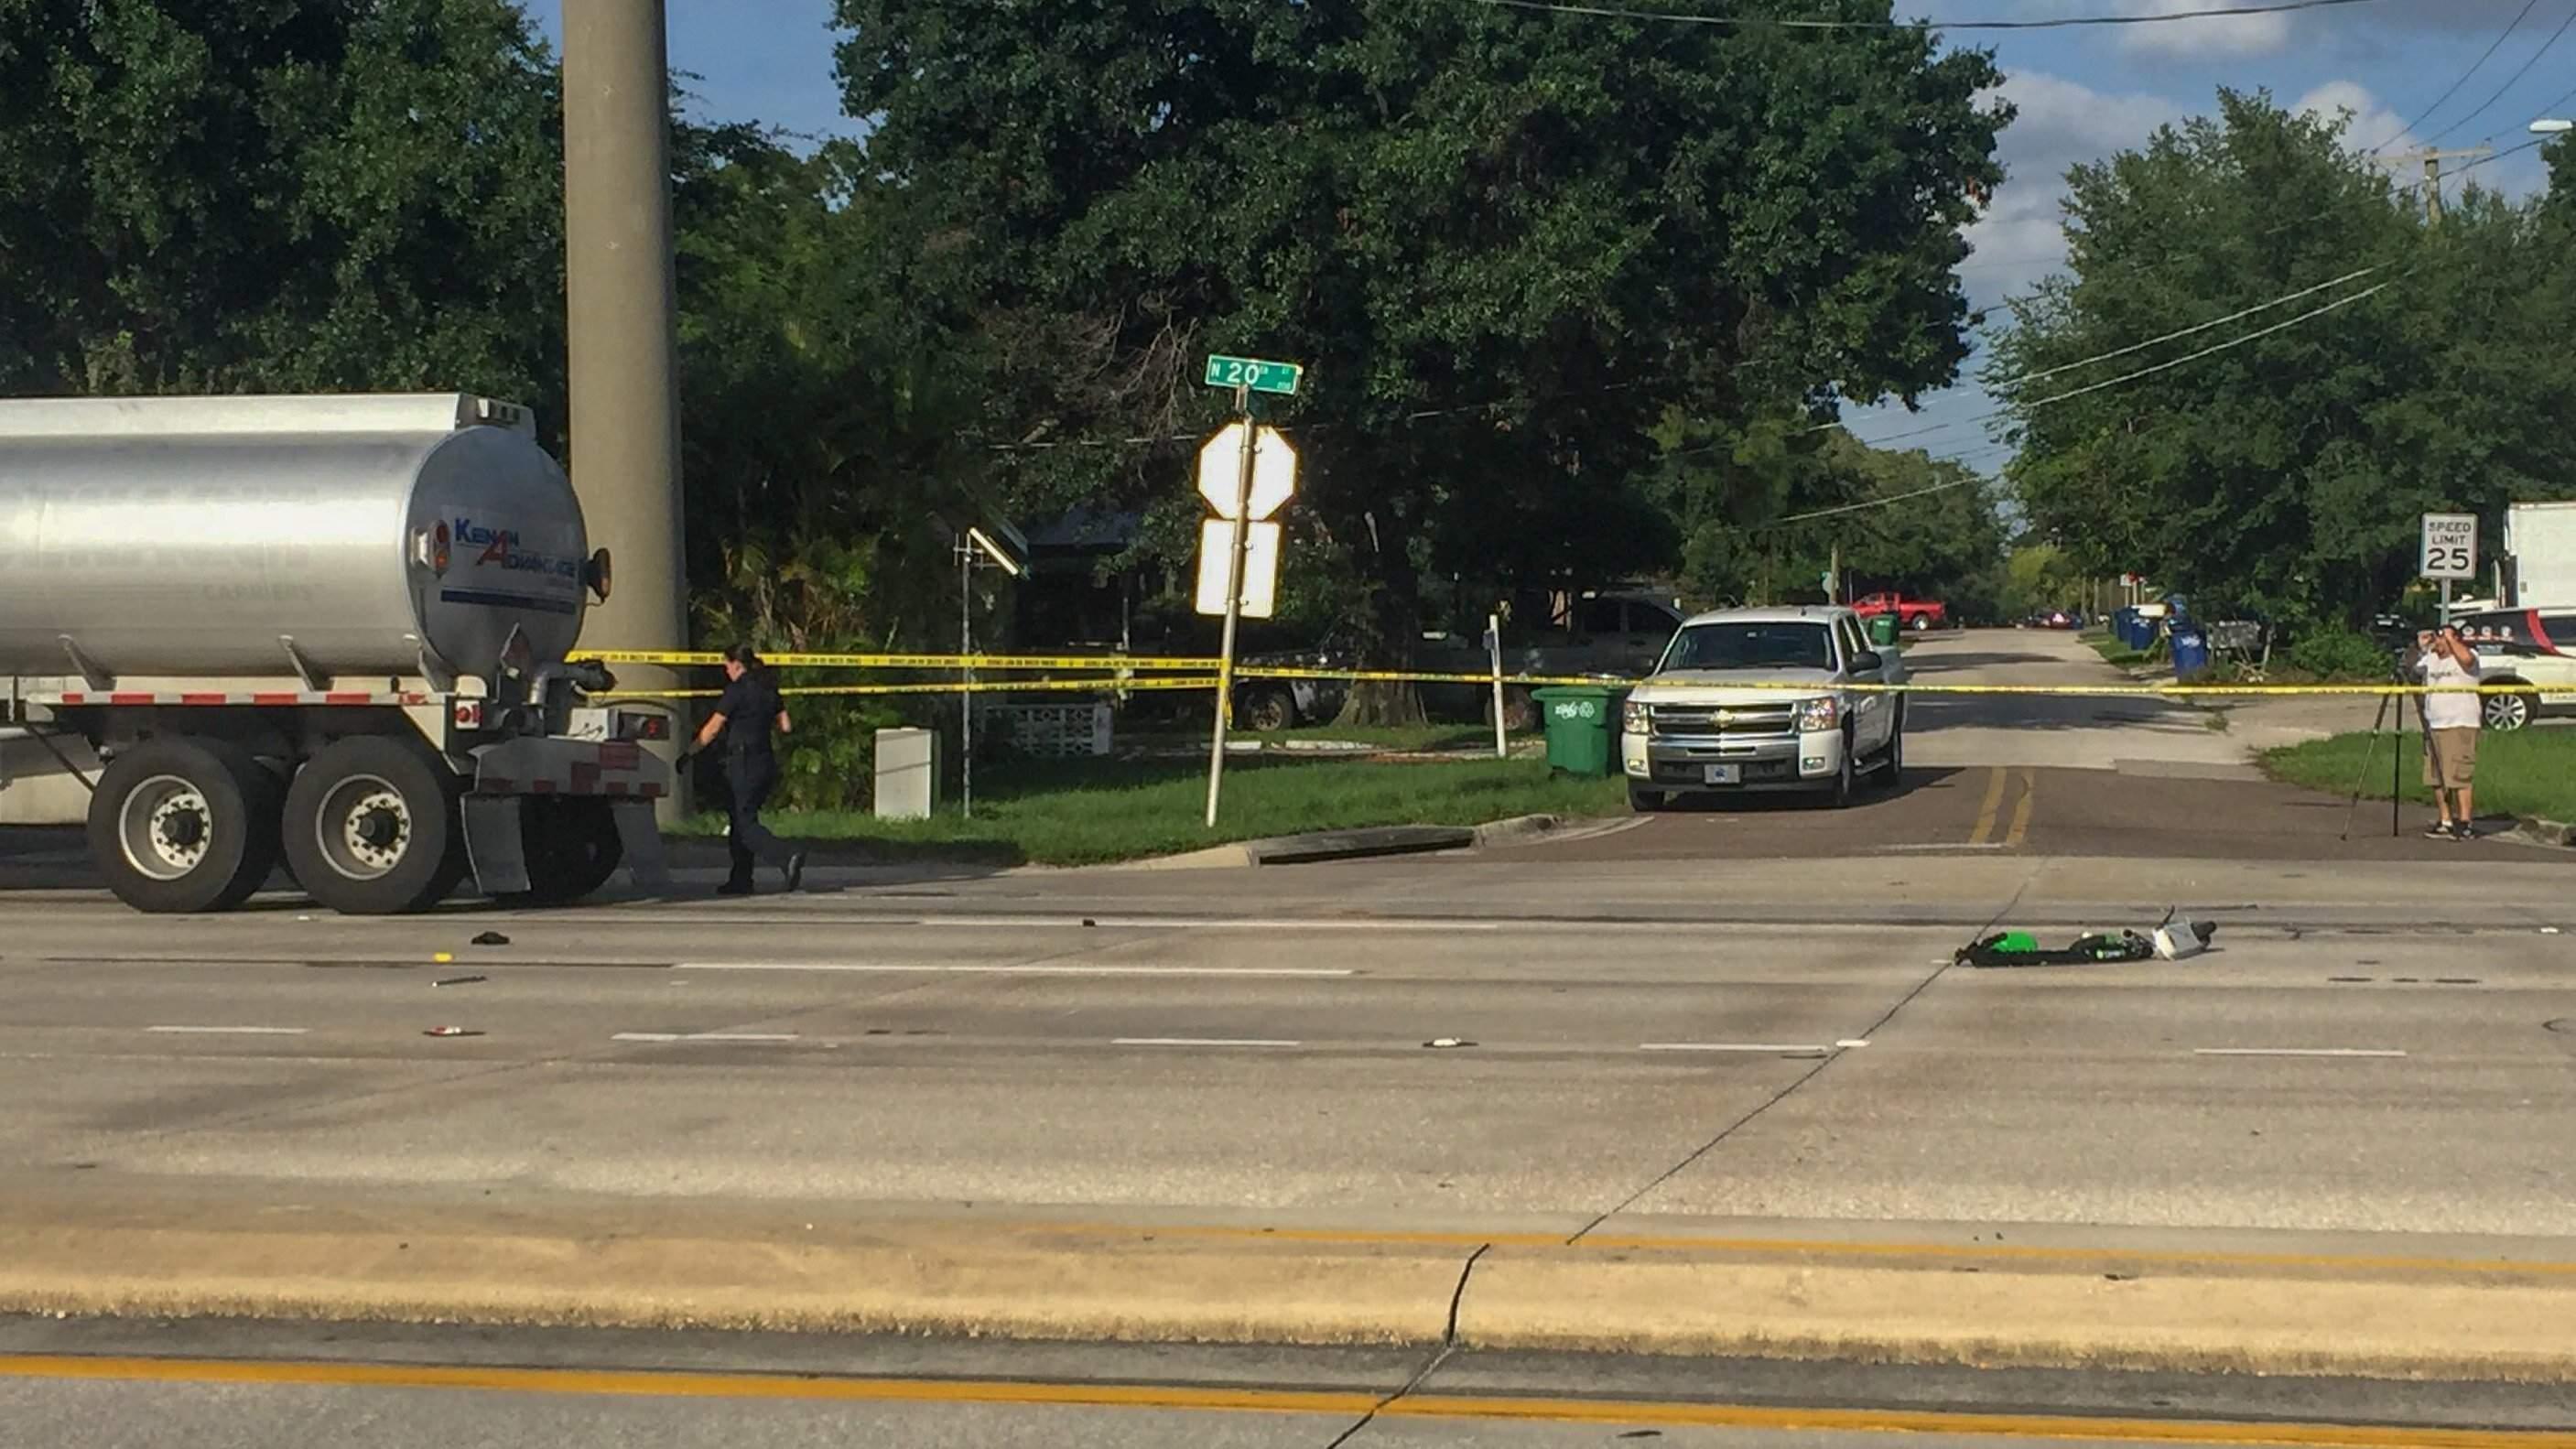 Tampa police identify e-scooter rider struck by semi-trailer